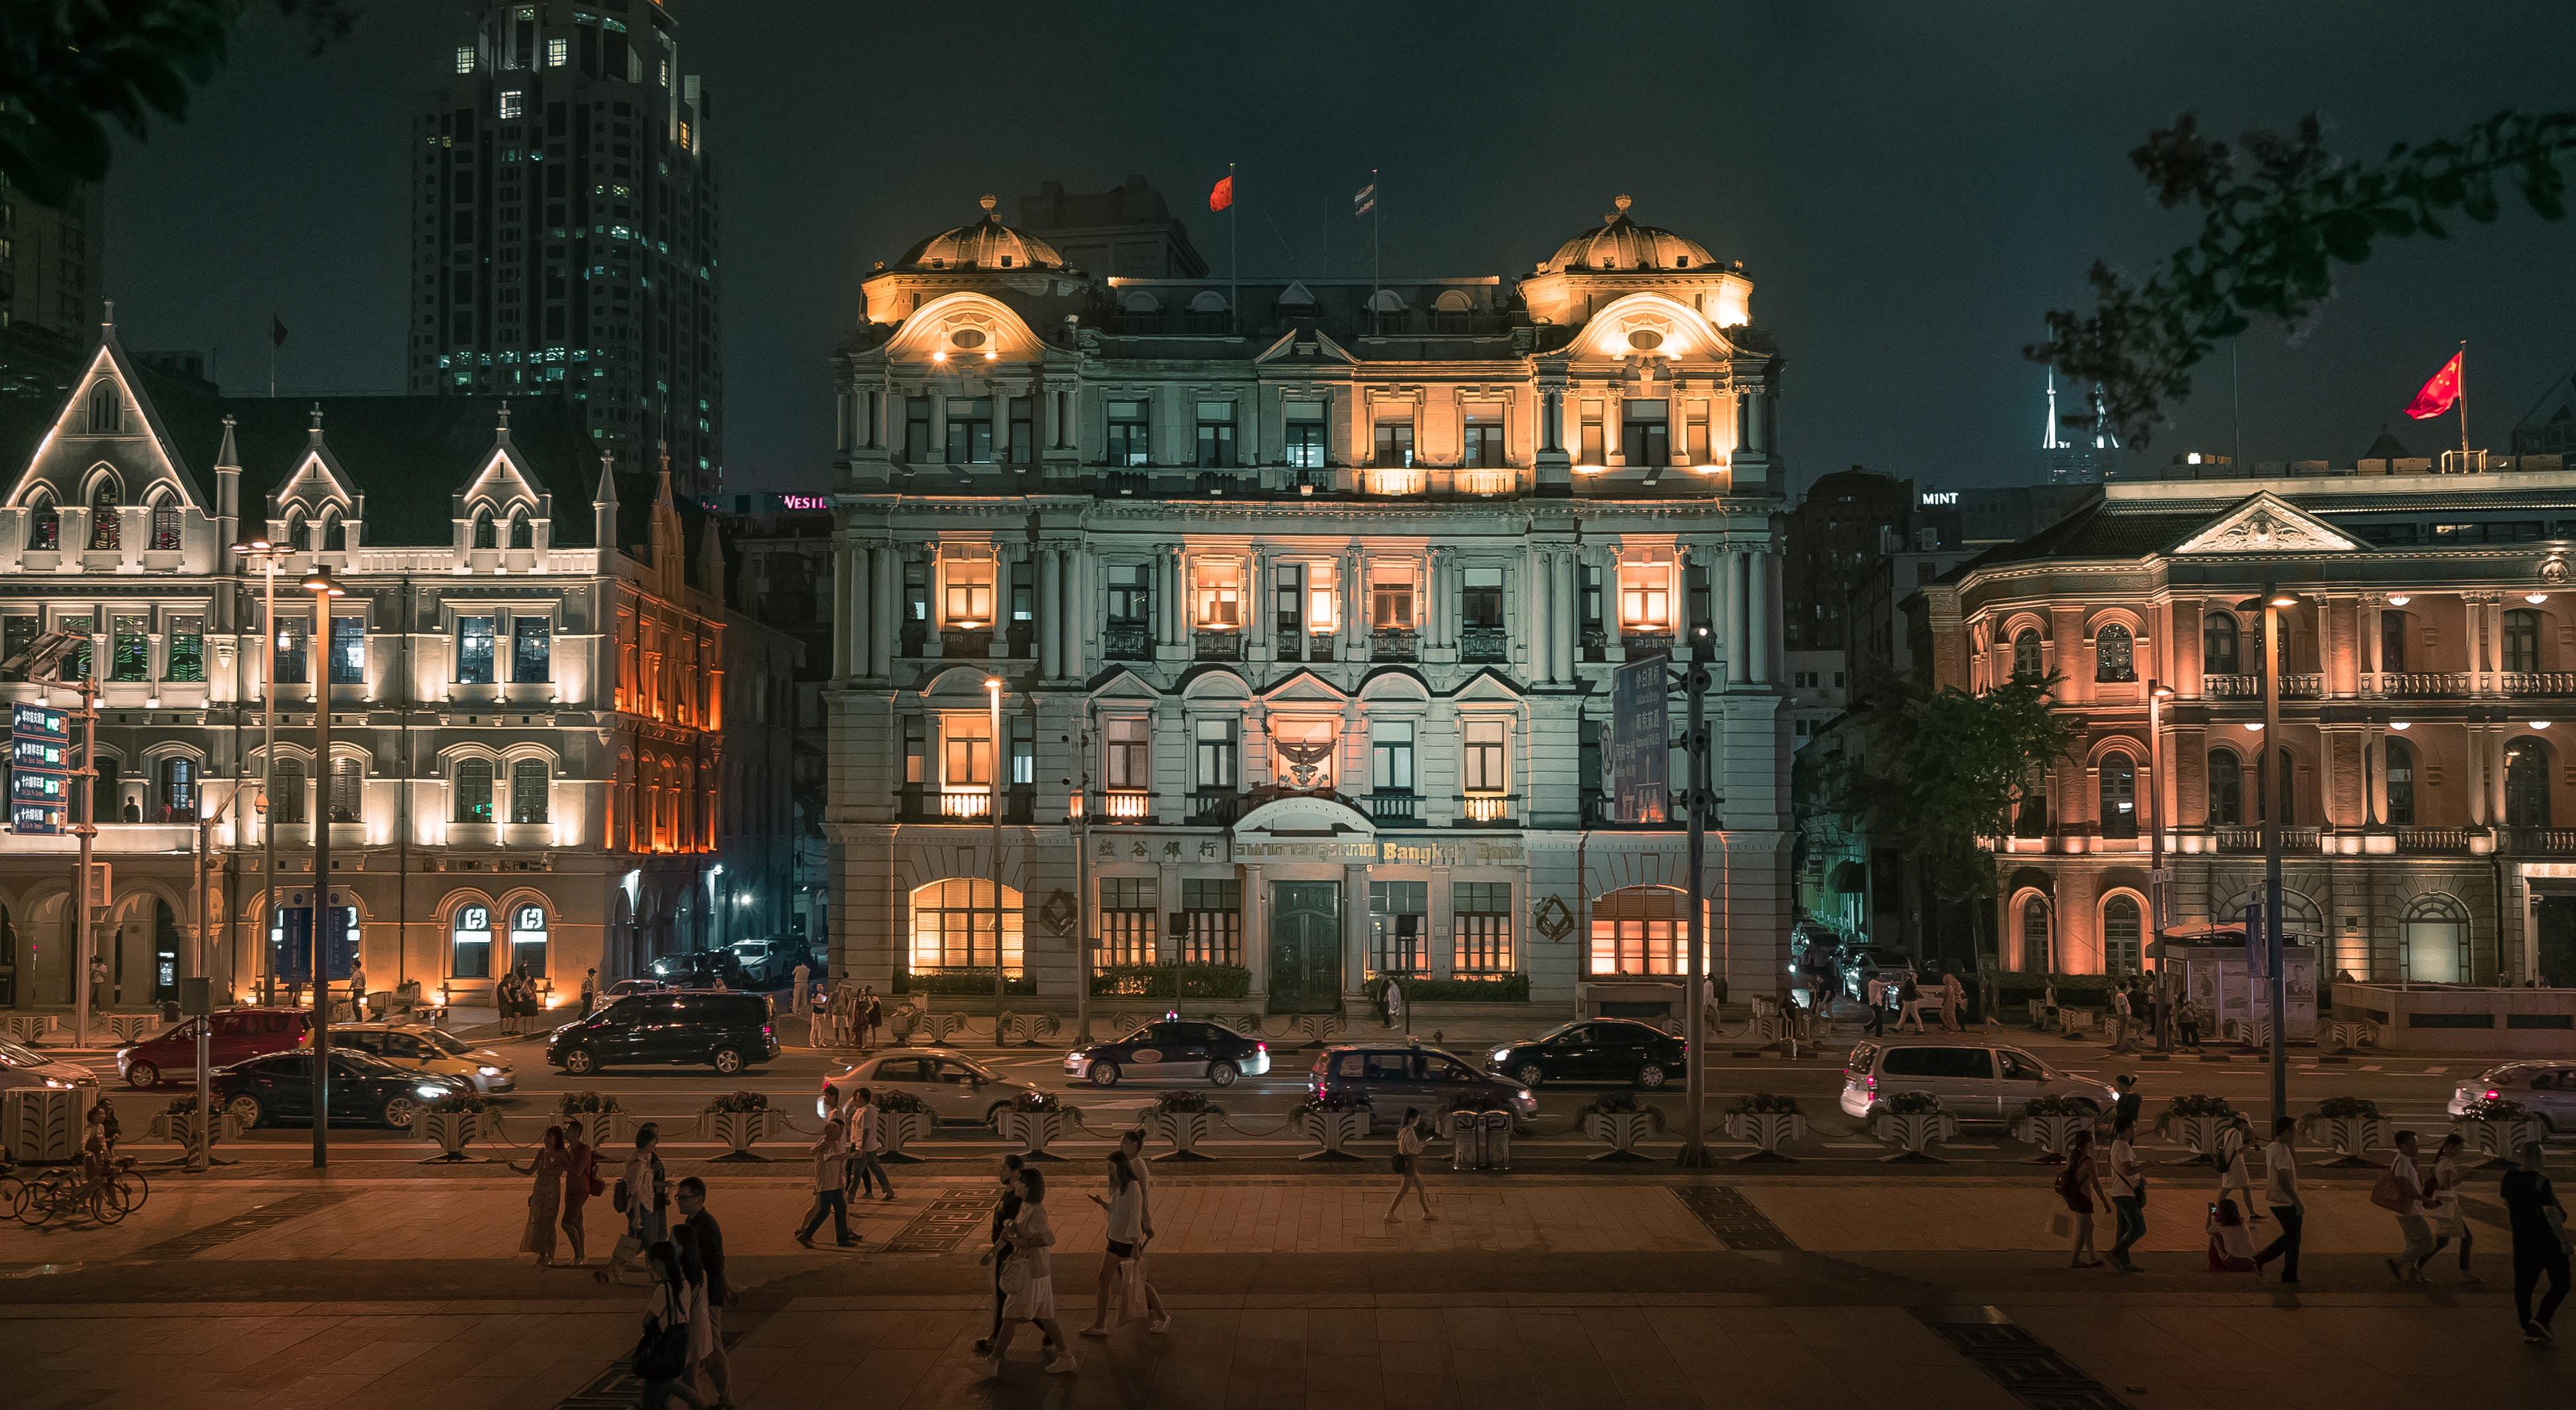 people walking in the street during nighttime